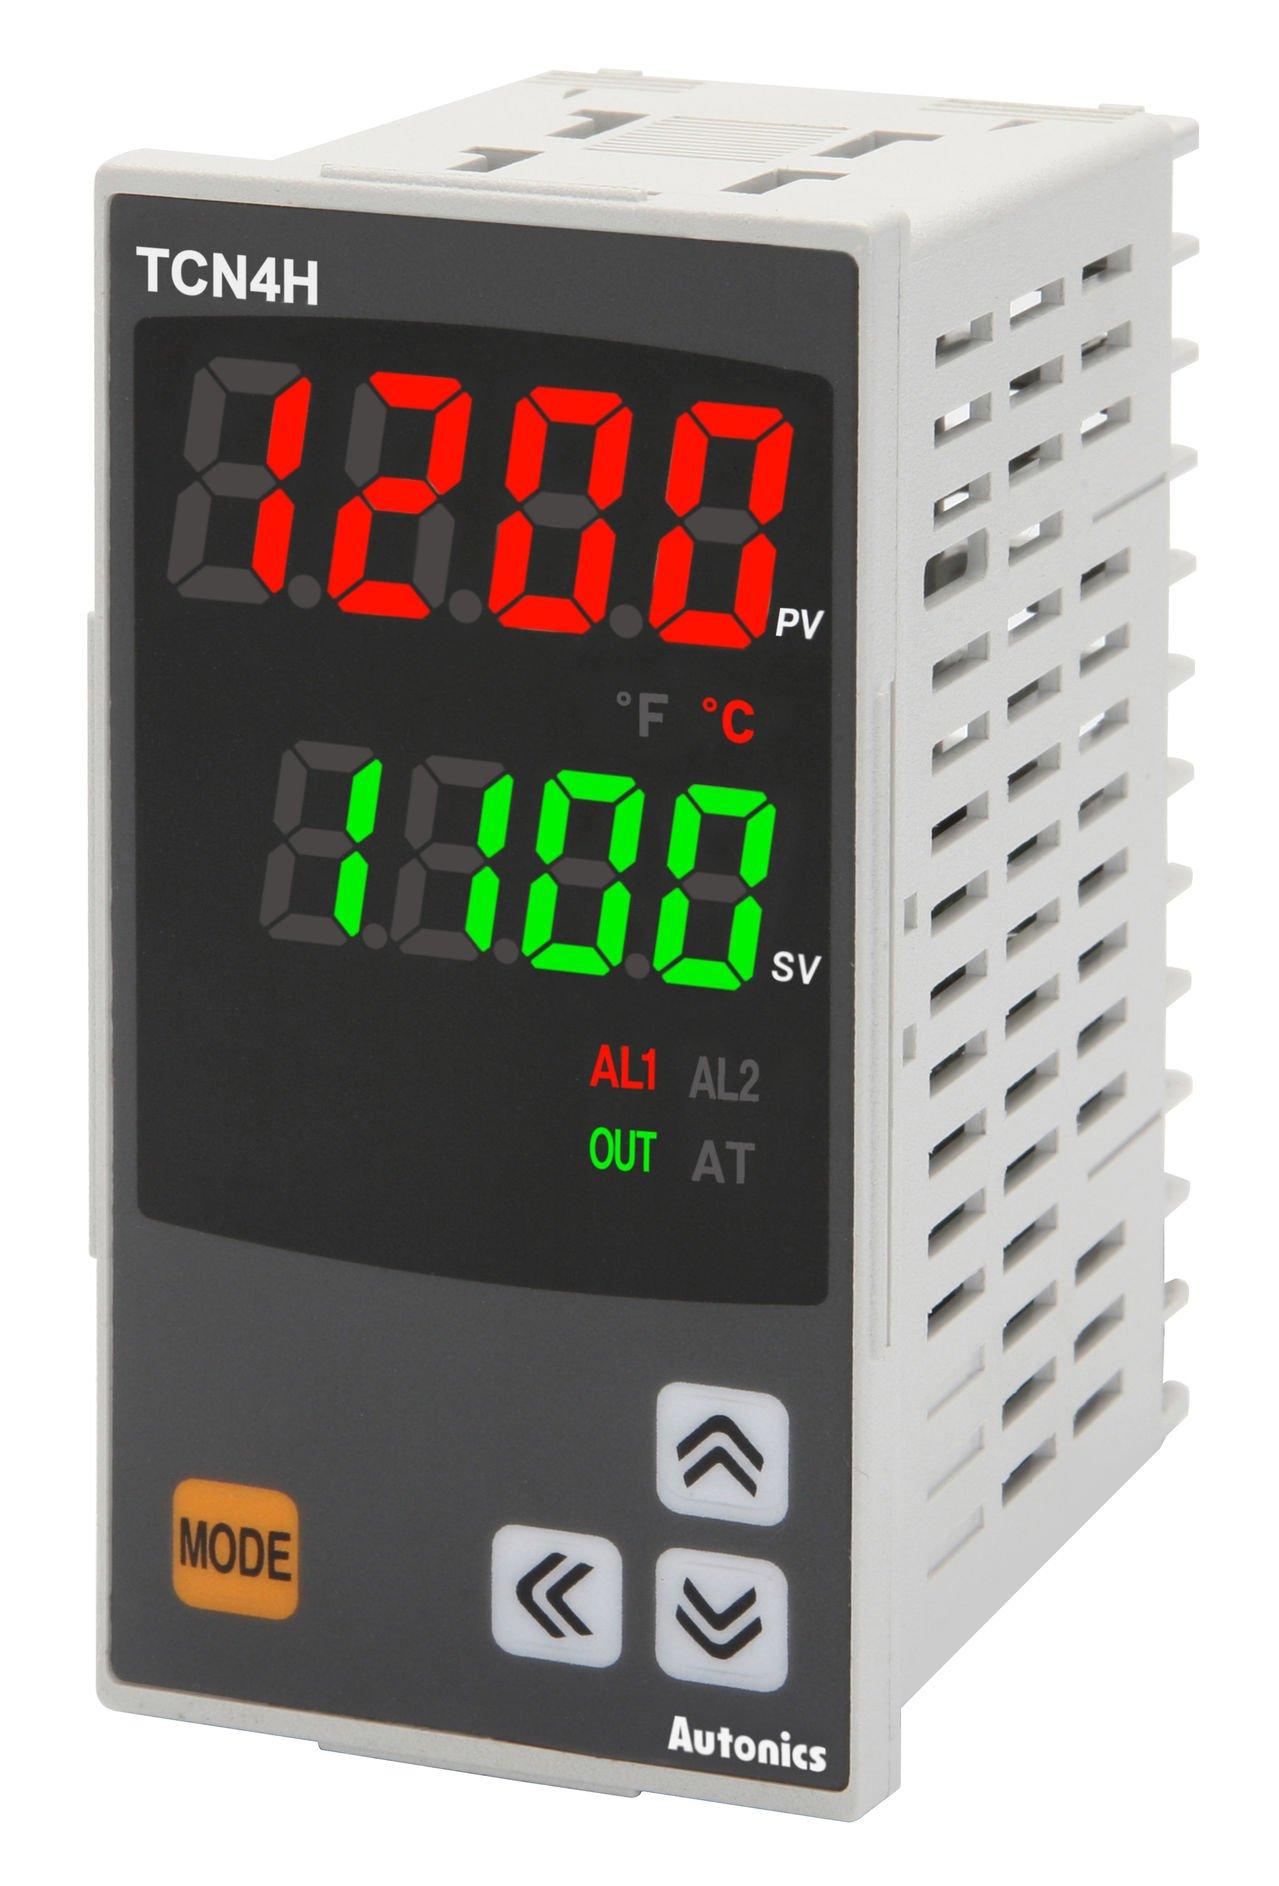 Autonics TCN4H-24R Temp Control, 1/8DIN, Dual display 4 Digit, PID Control, Relay & SSR Output, 2 Alarm Output, 100-240 VAC